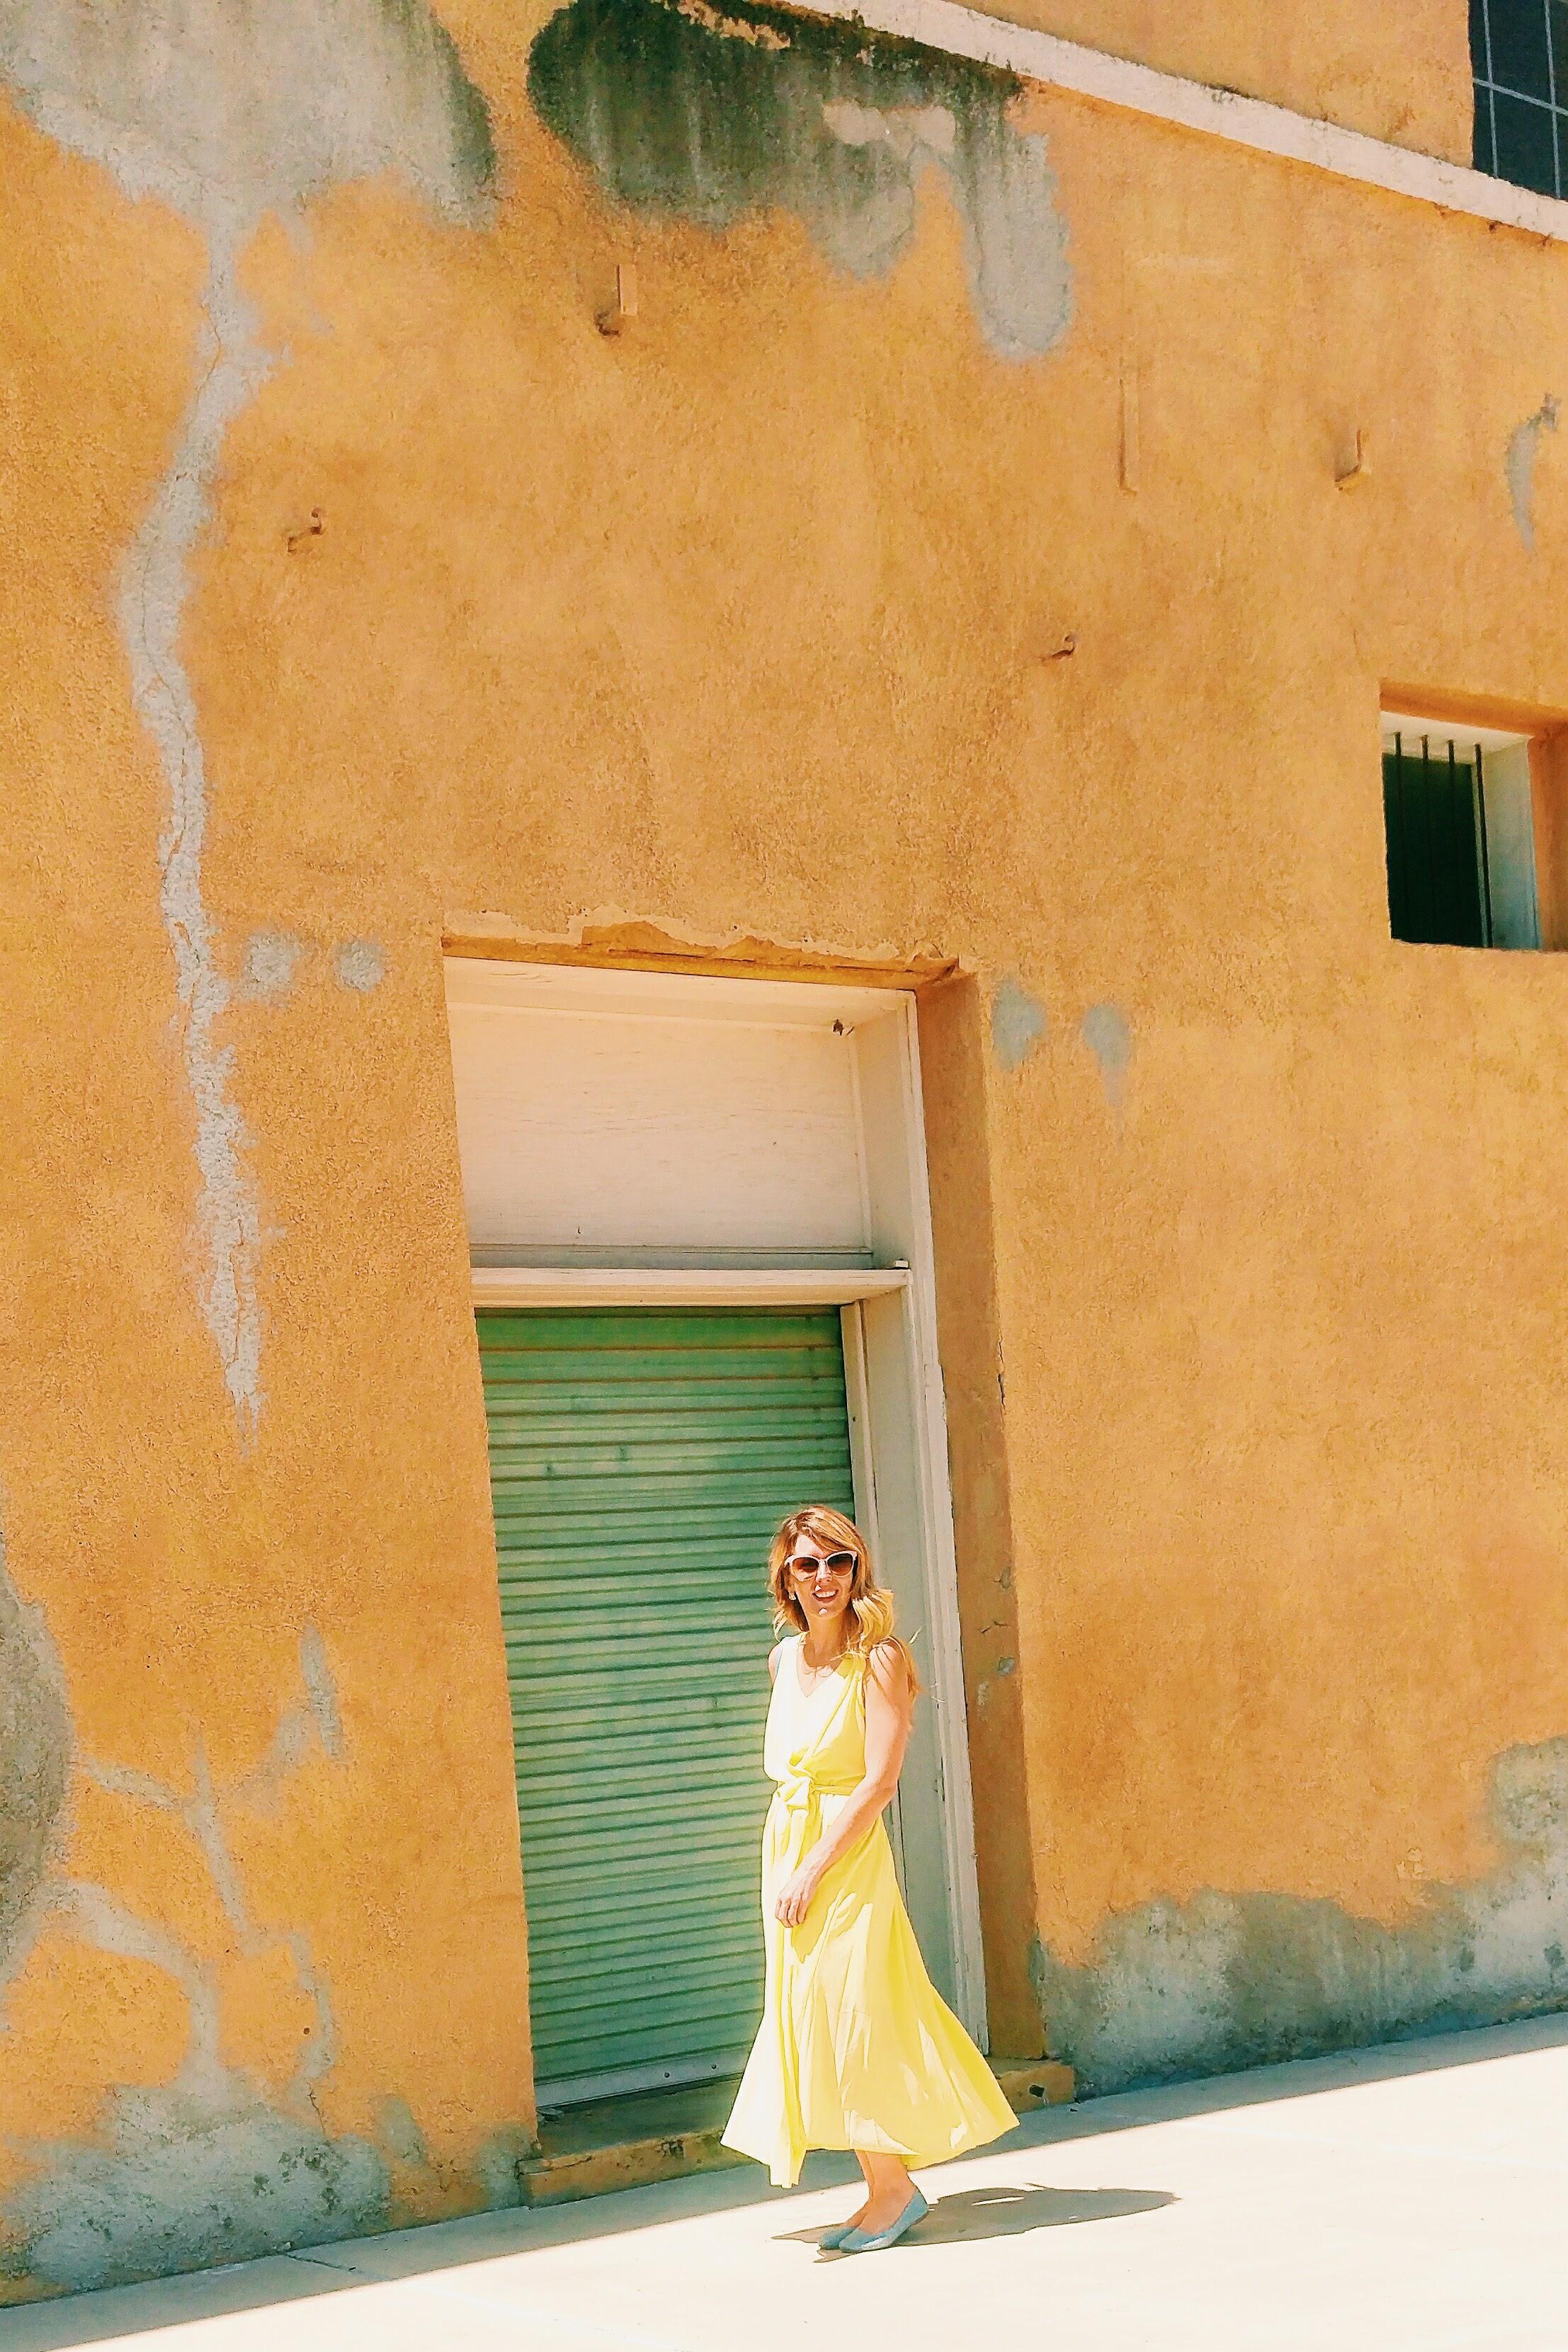 Small Town Charm - Navasota - Three Heel Clicks 3.jpg